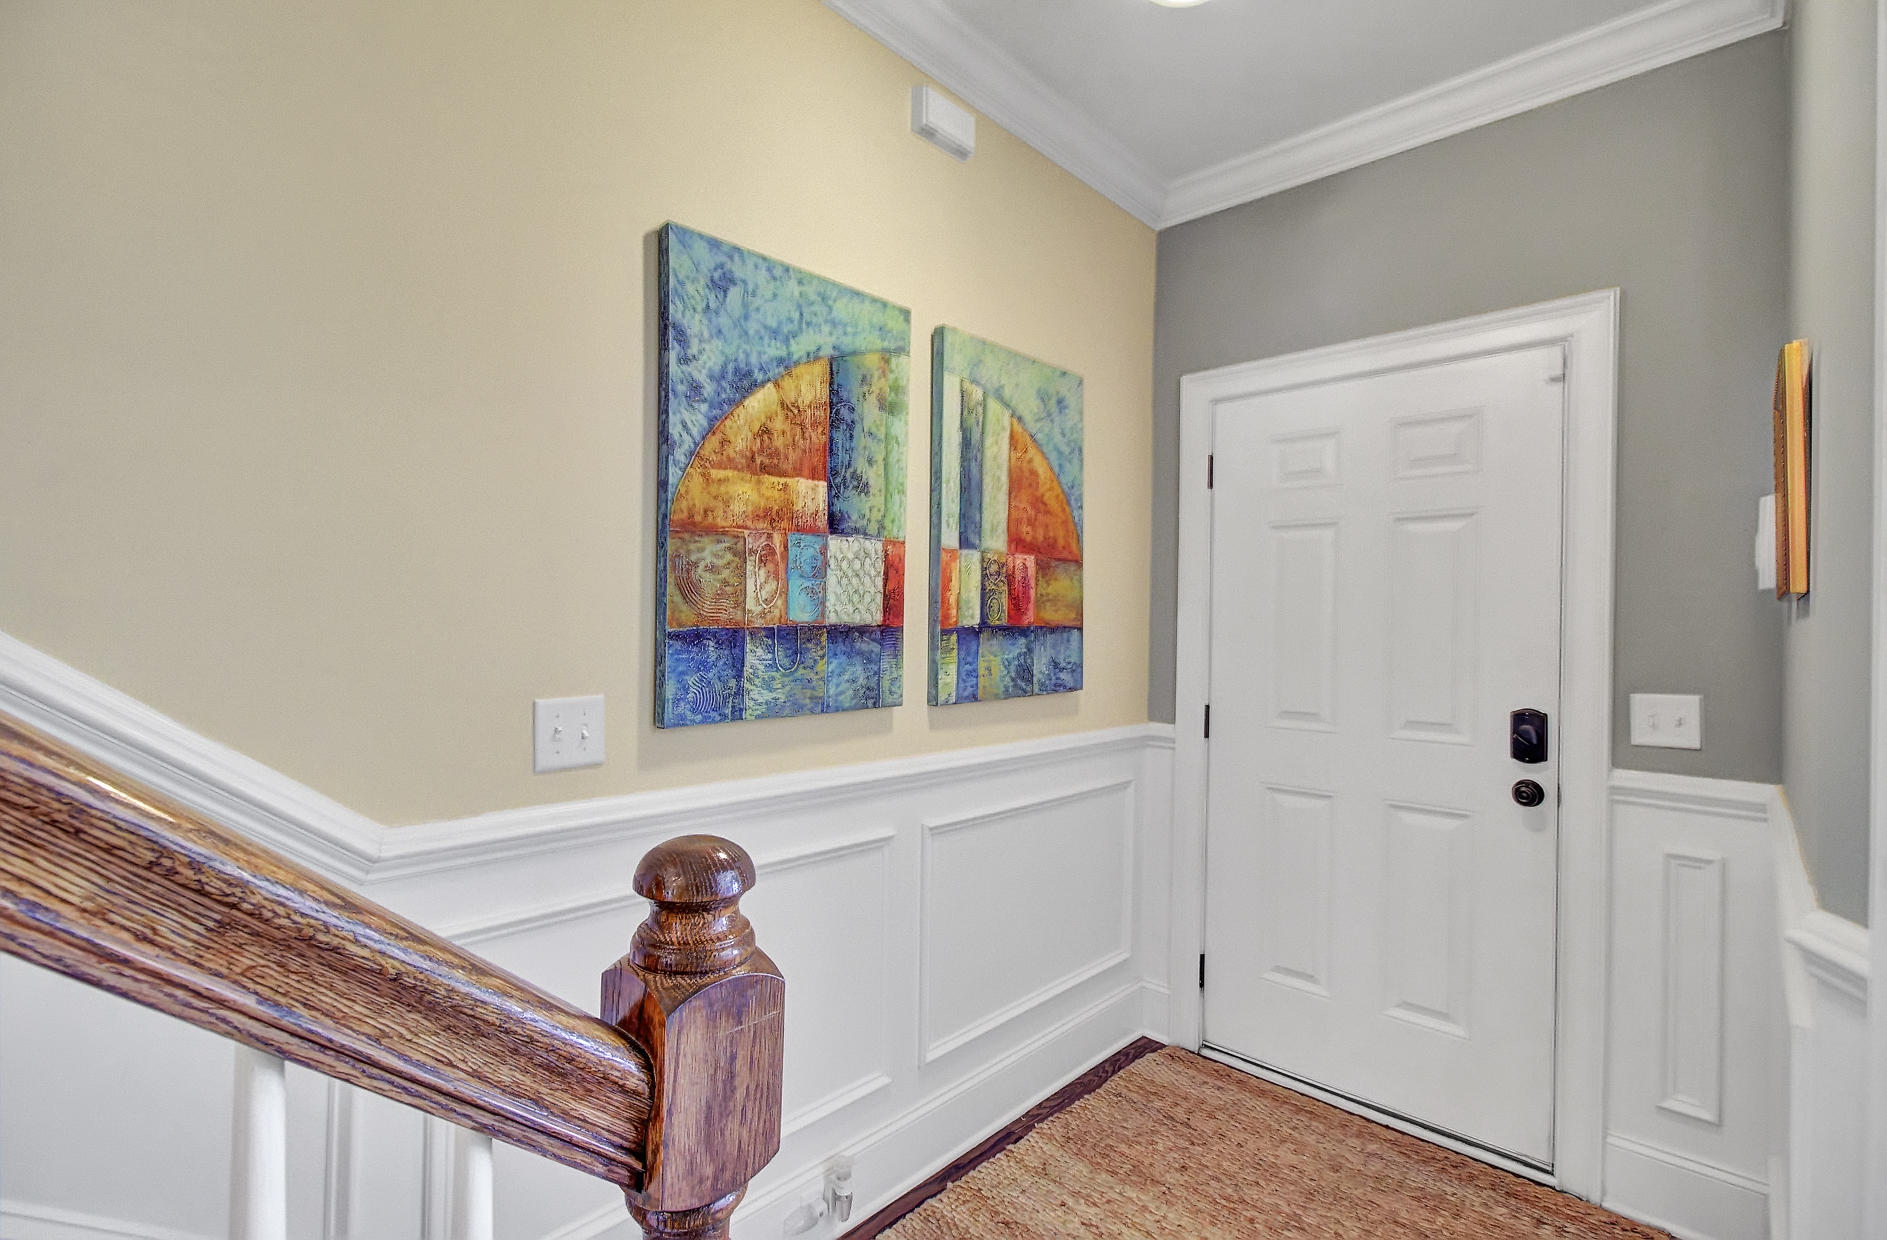 Carol Oaks Town Homes Homes For Sale - 2956 Emma, Mount Pleasant, SC - 15